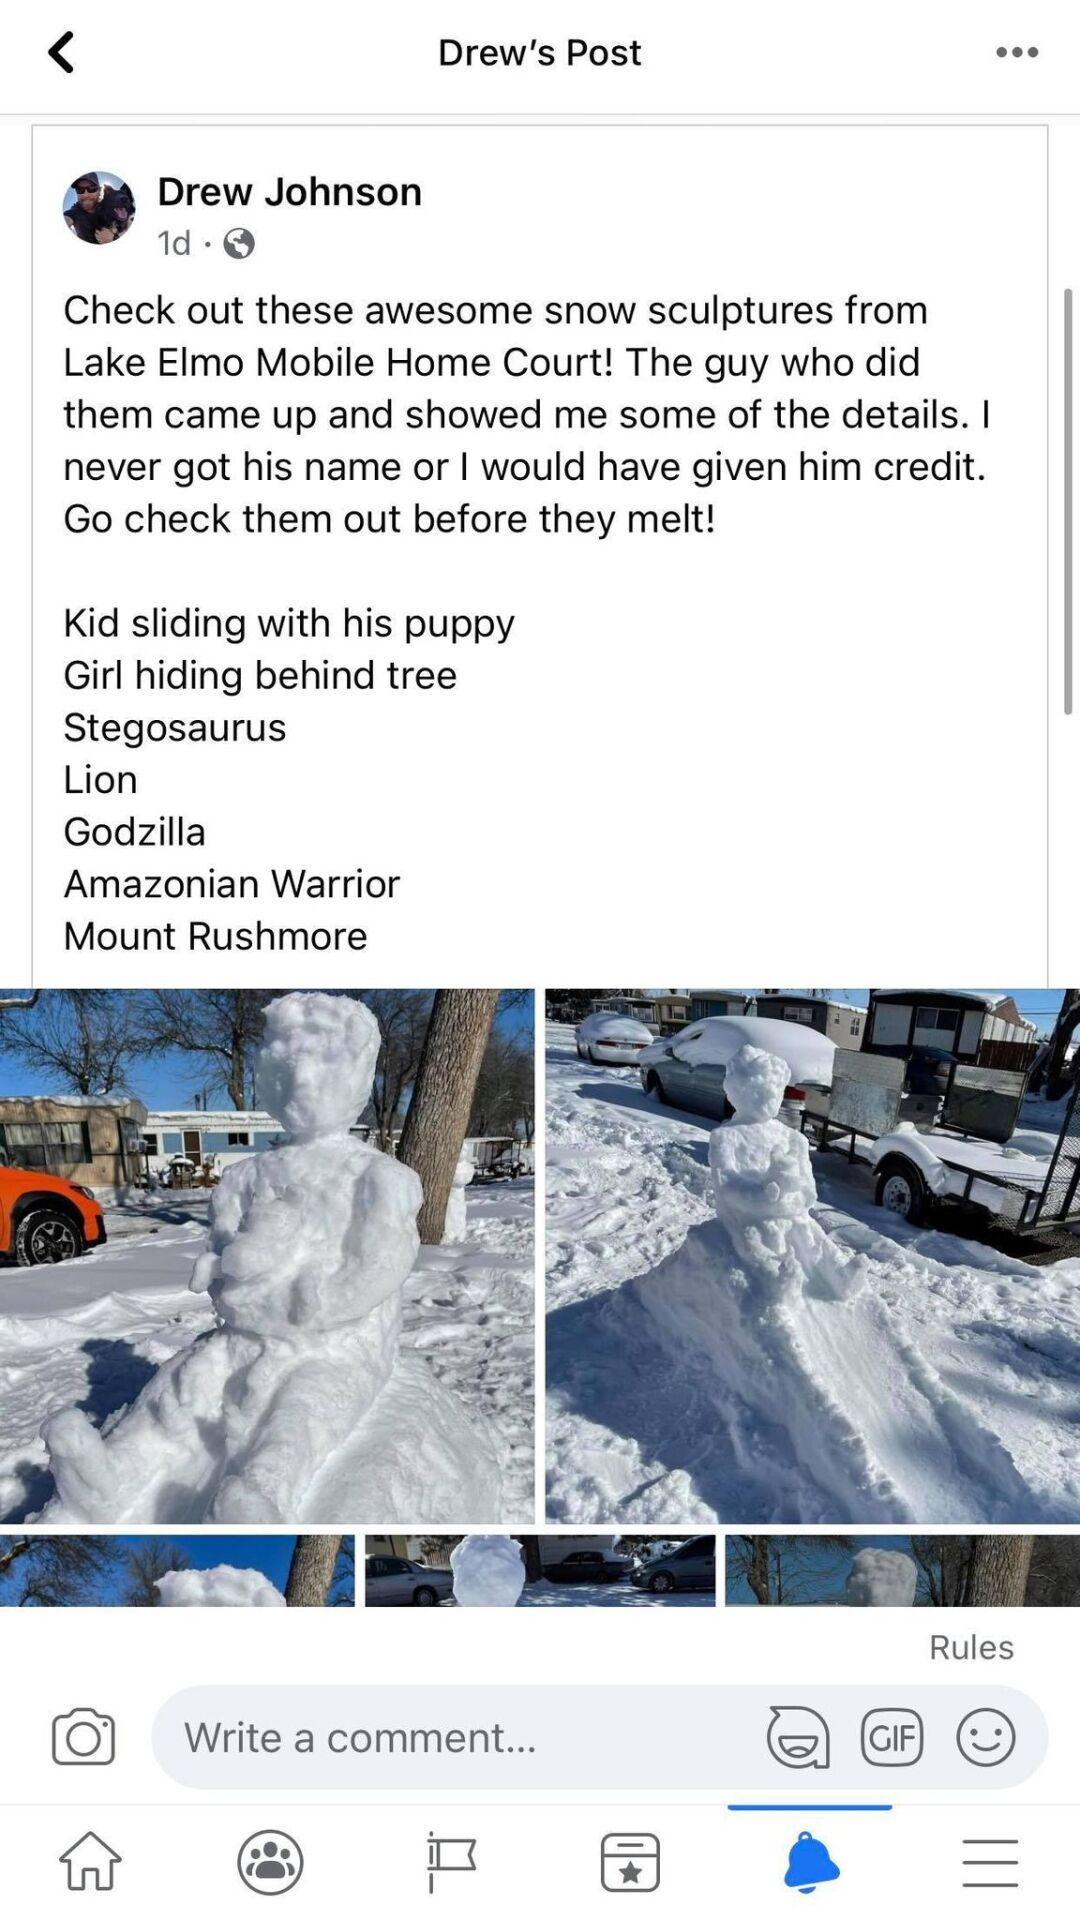 Snow sculptures pop up near Lake Elmo Mobile Home Court